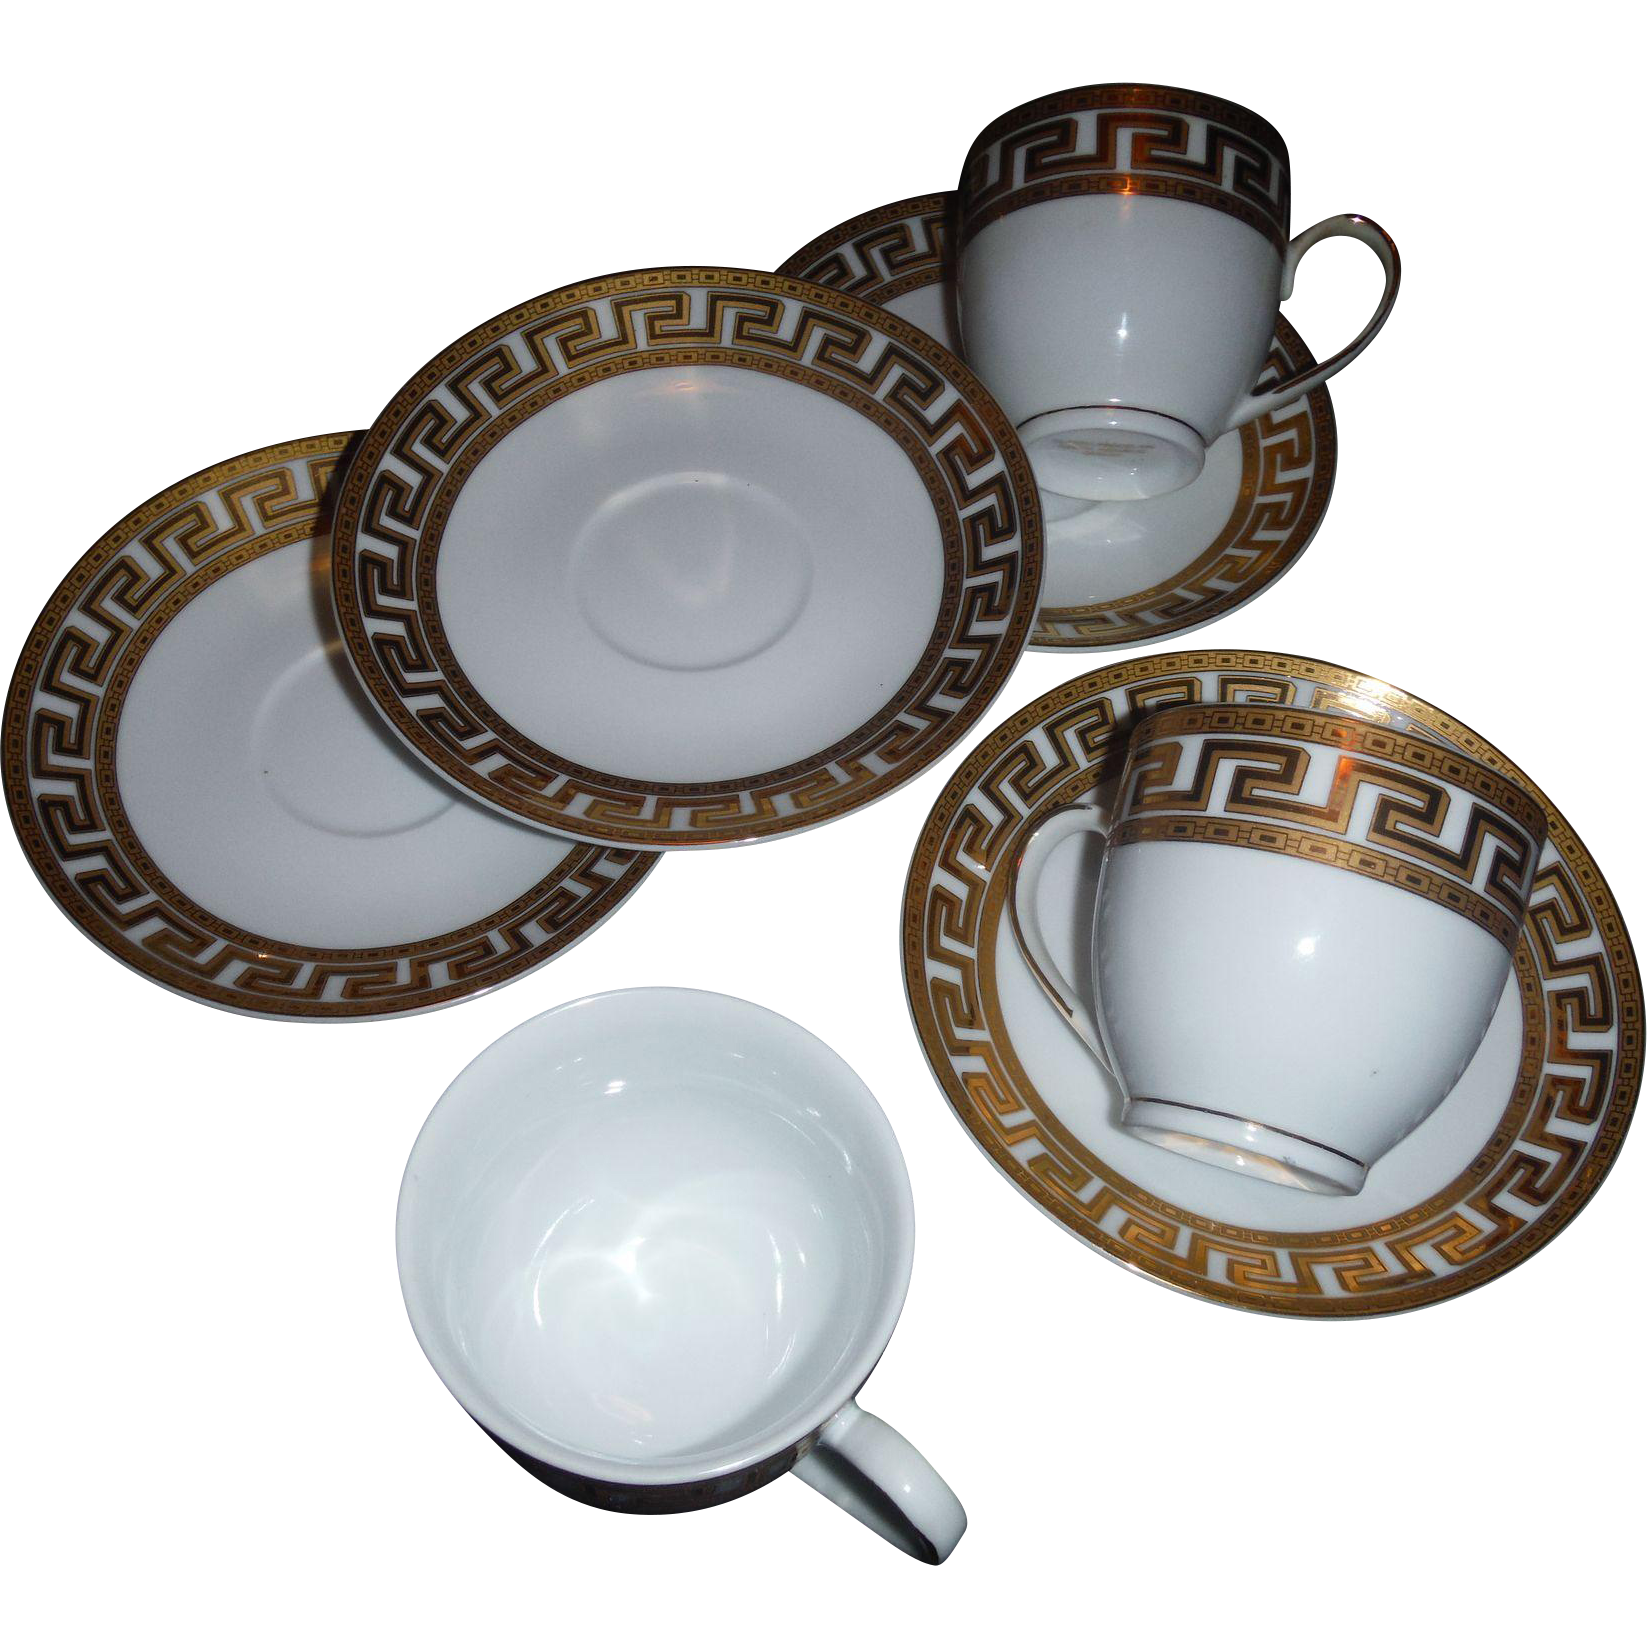 Key Art Design : Greek key art deco design cups and saucers sold on